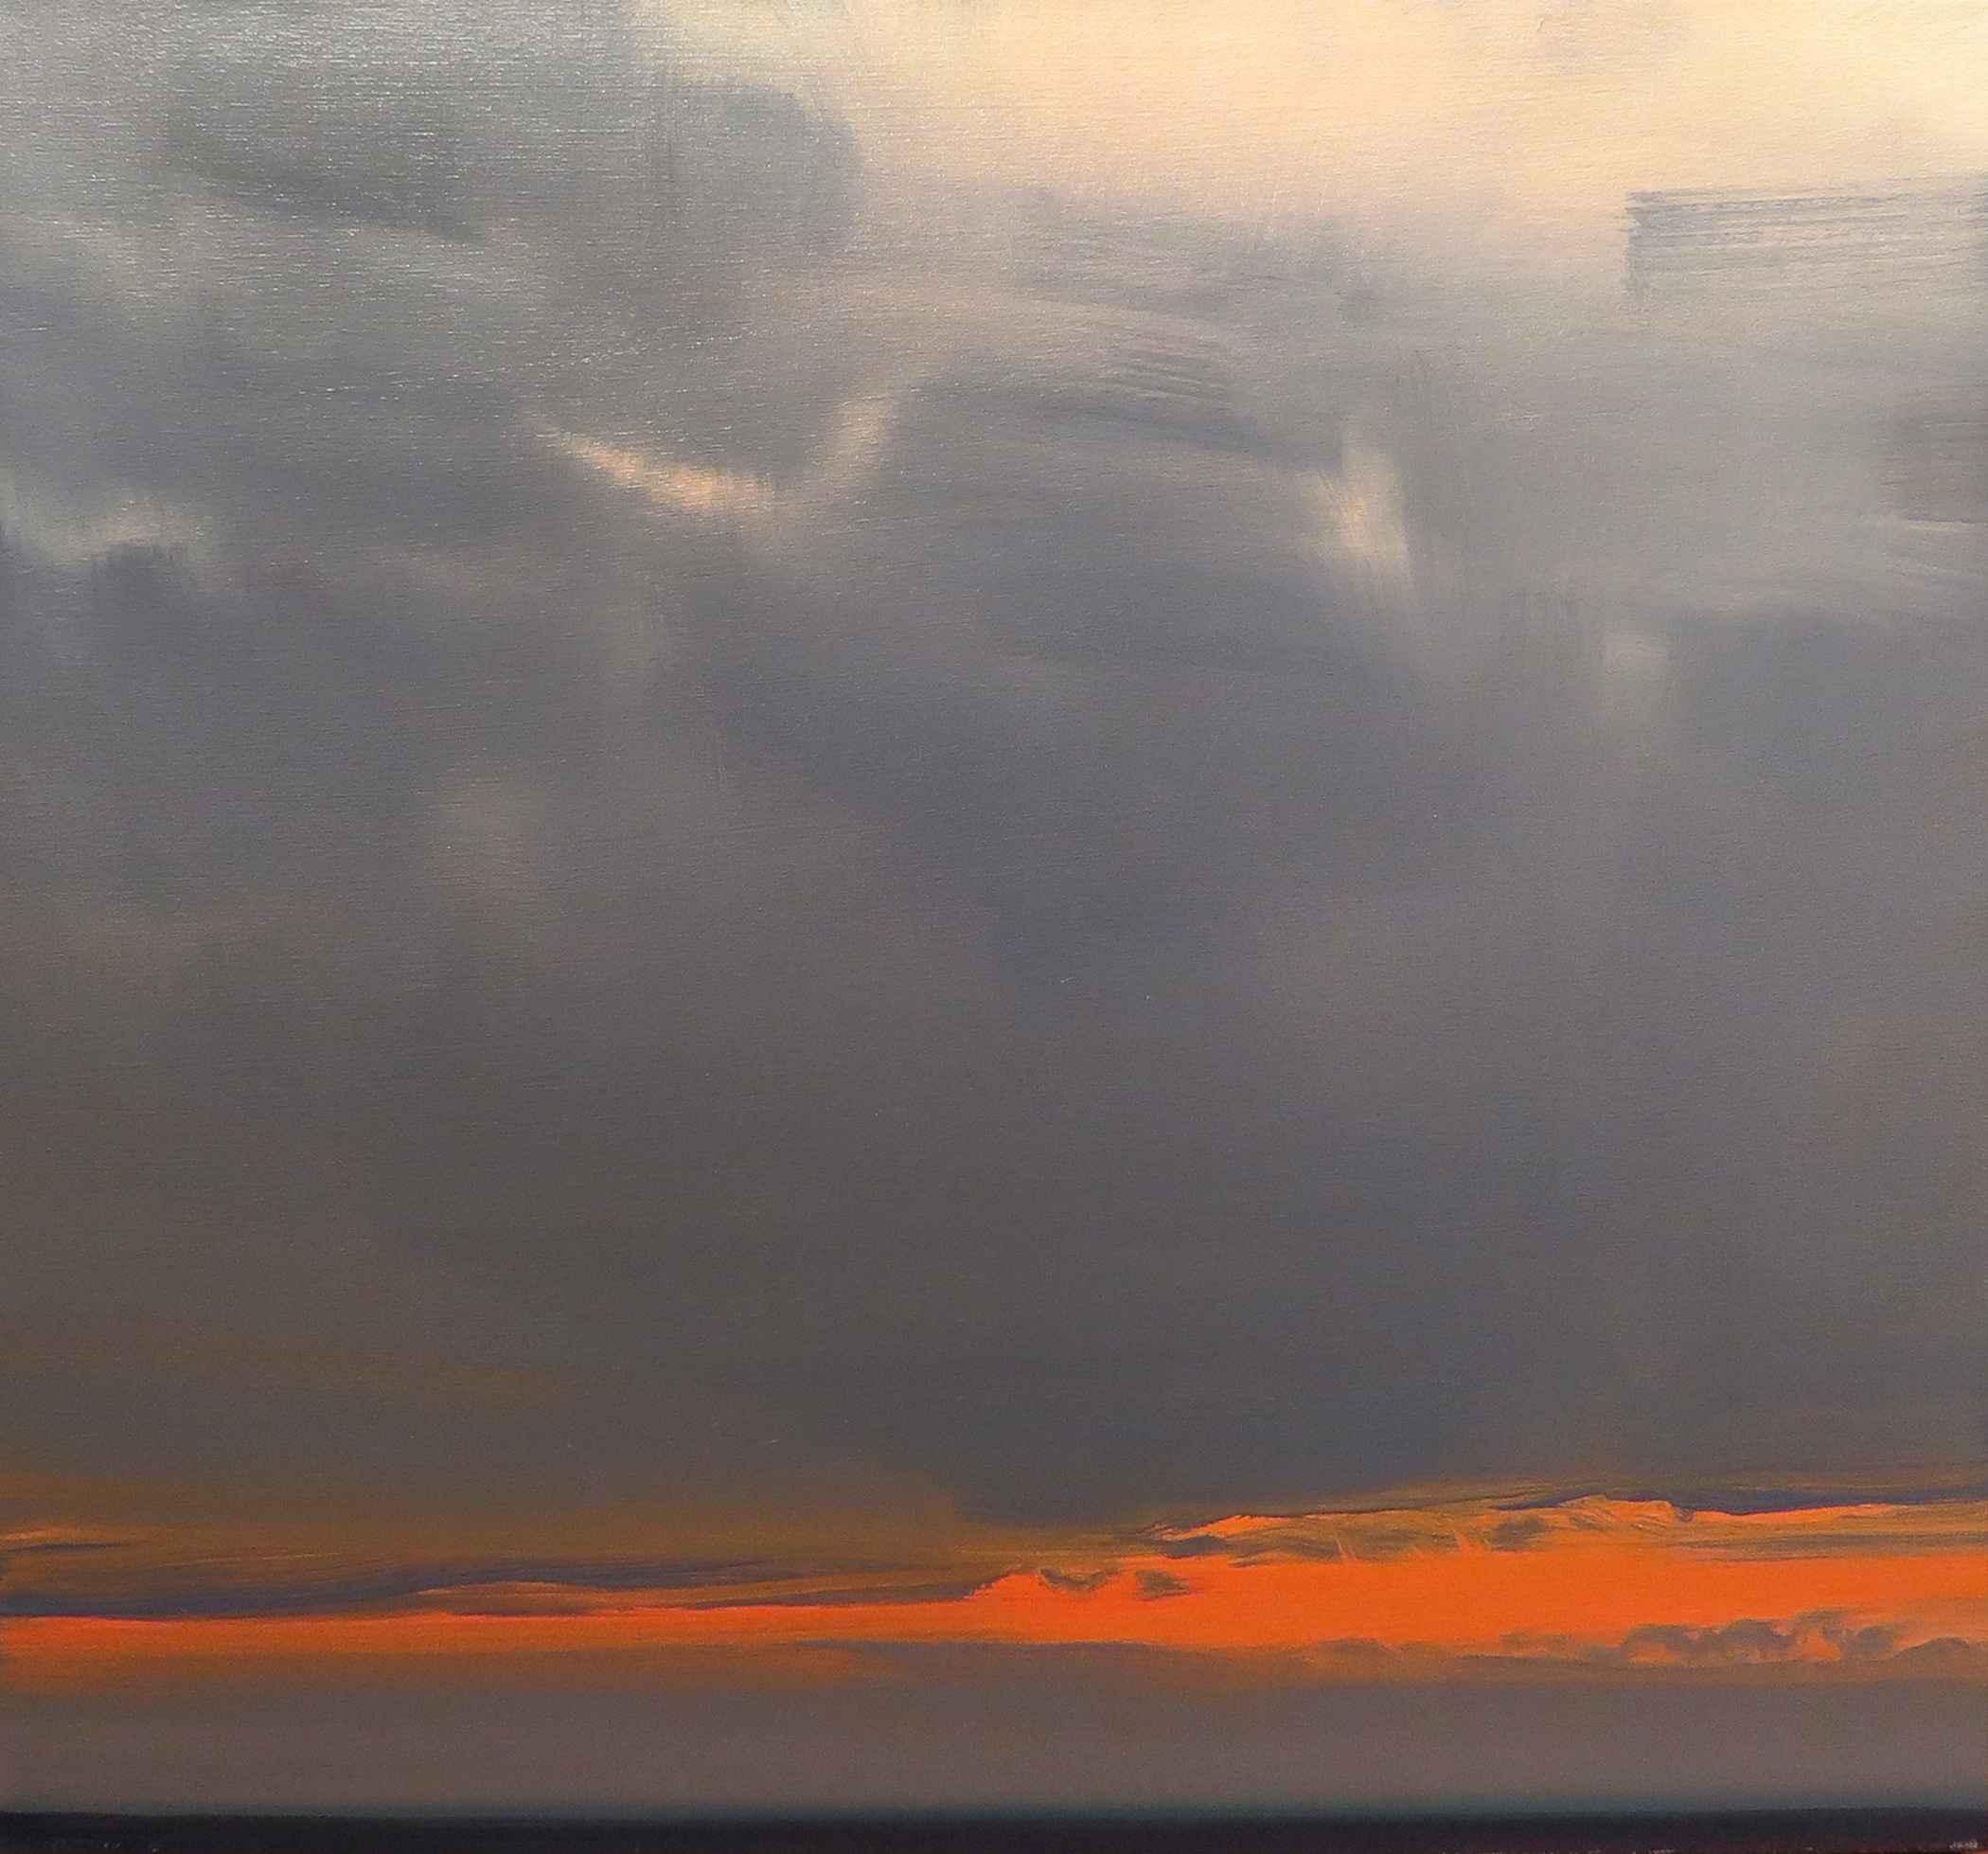 Weather - Night Closi... by  Lisa Grossman - Masterpiece Online